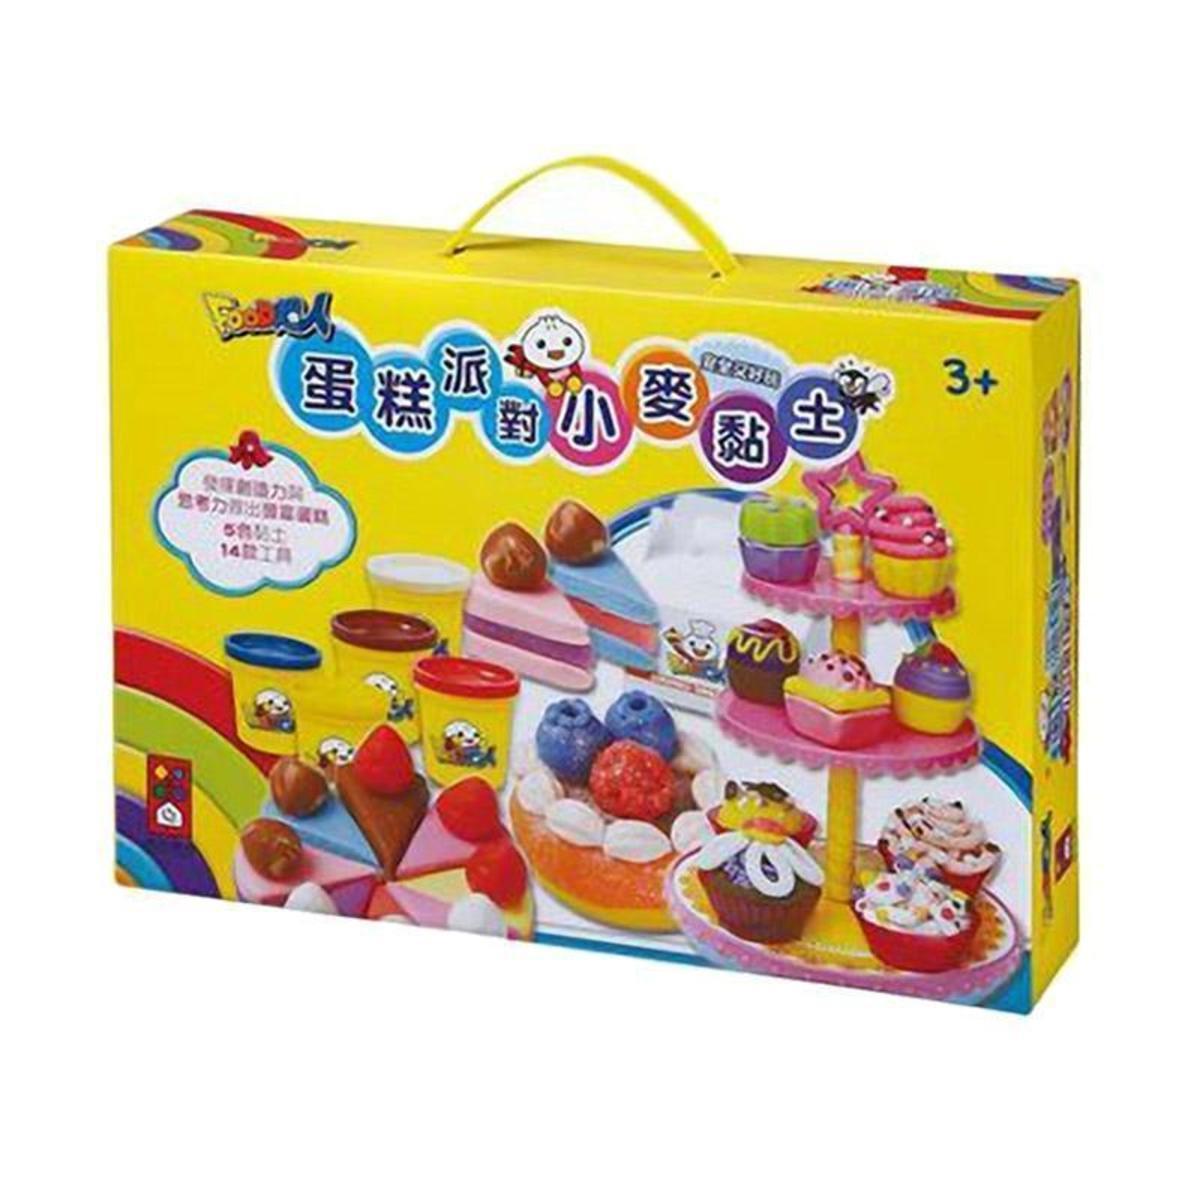 FOOD超人 蛋糕派對小麥黏土 台灣進口 (3歲以上)